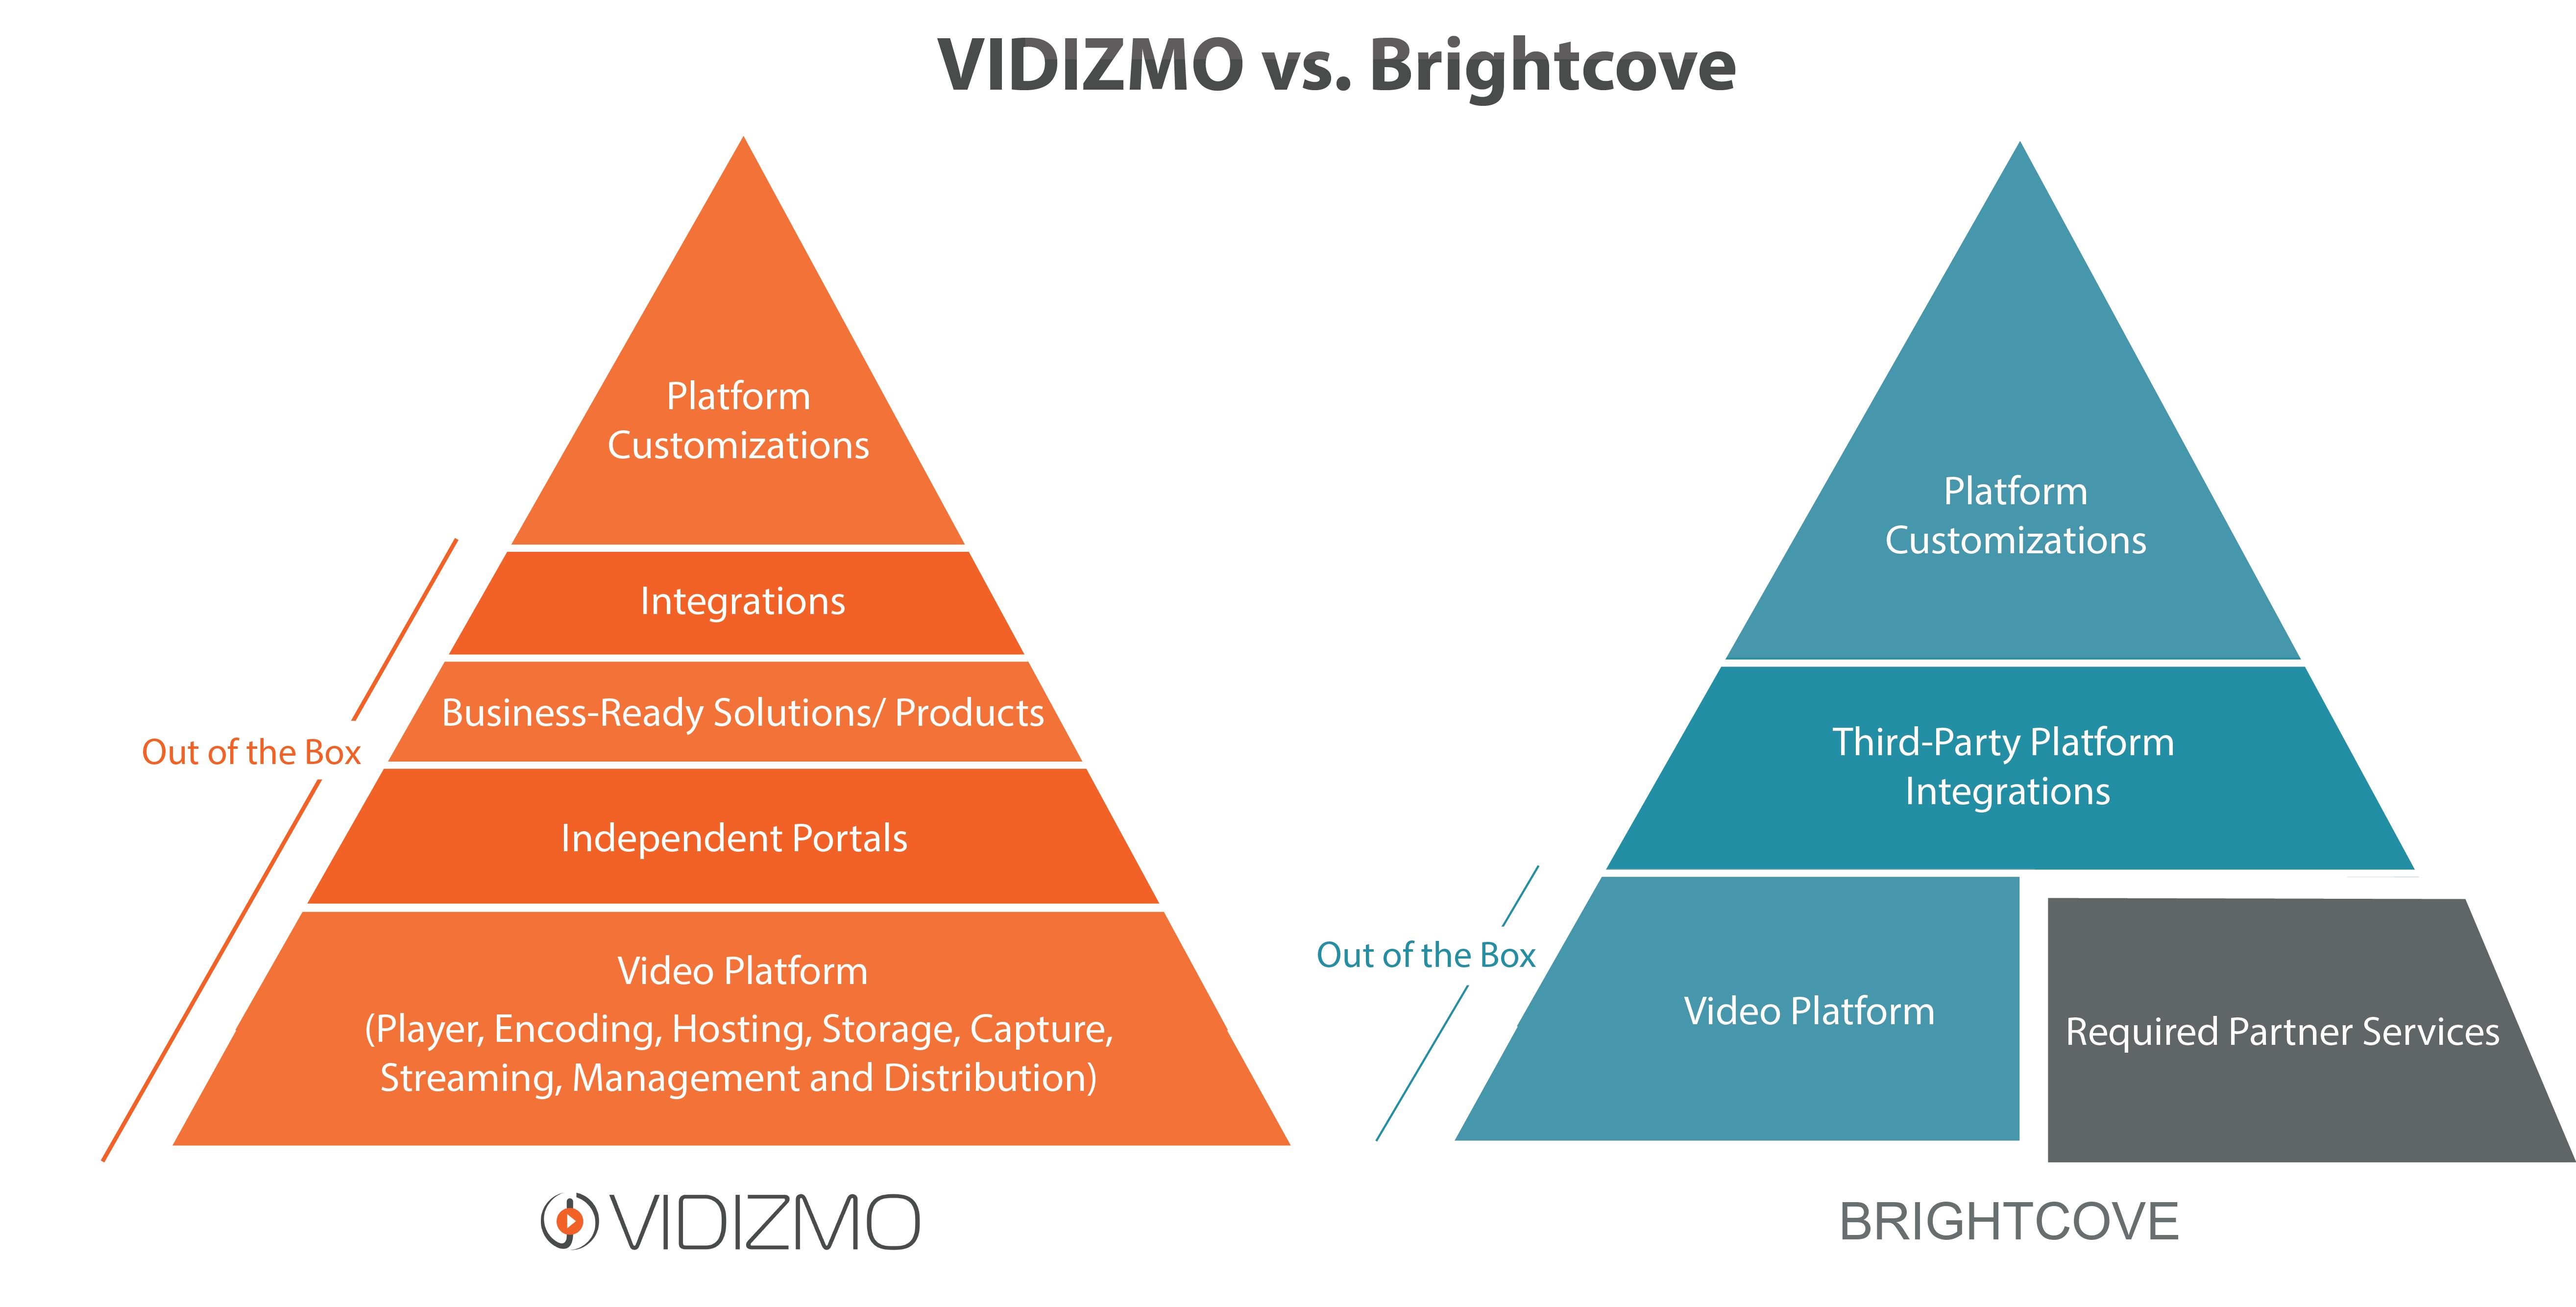 vidizmo vs. brightcove: A comparison of key video platform capabilities